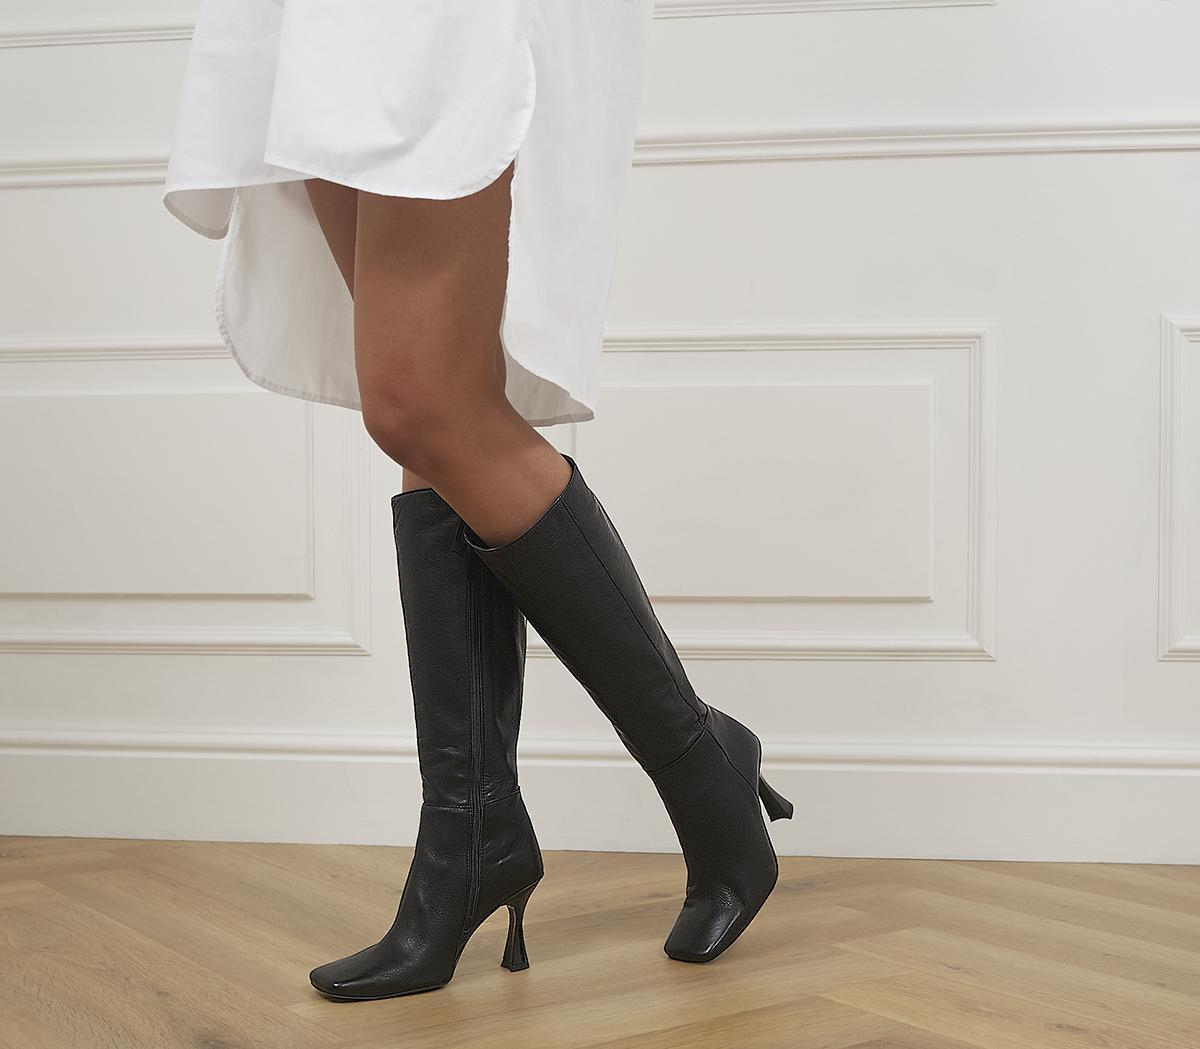 Kurtsey Square Toe Dressy Boots